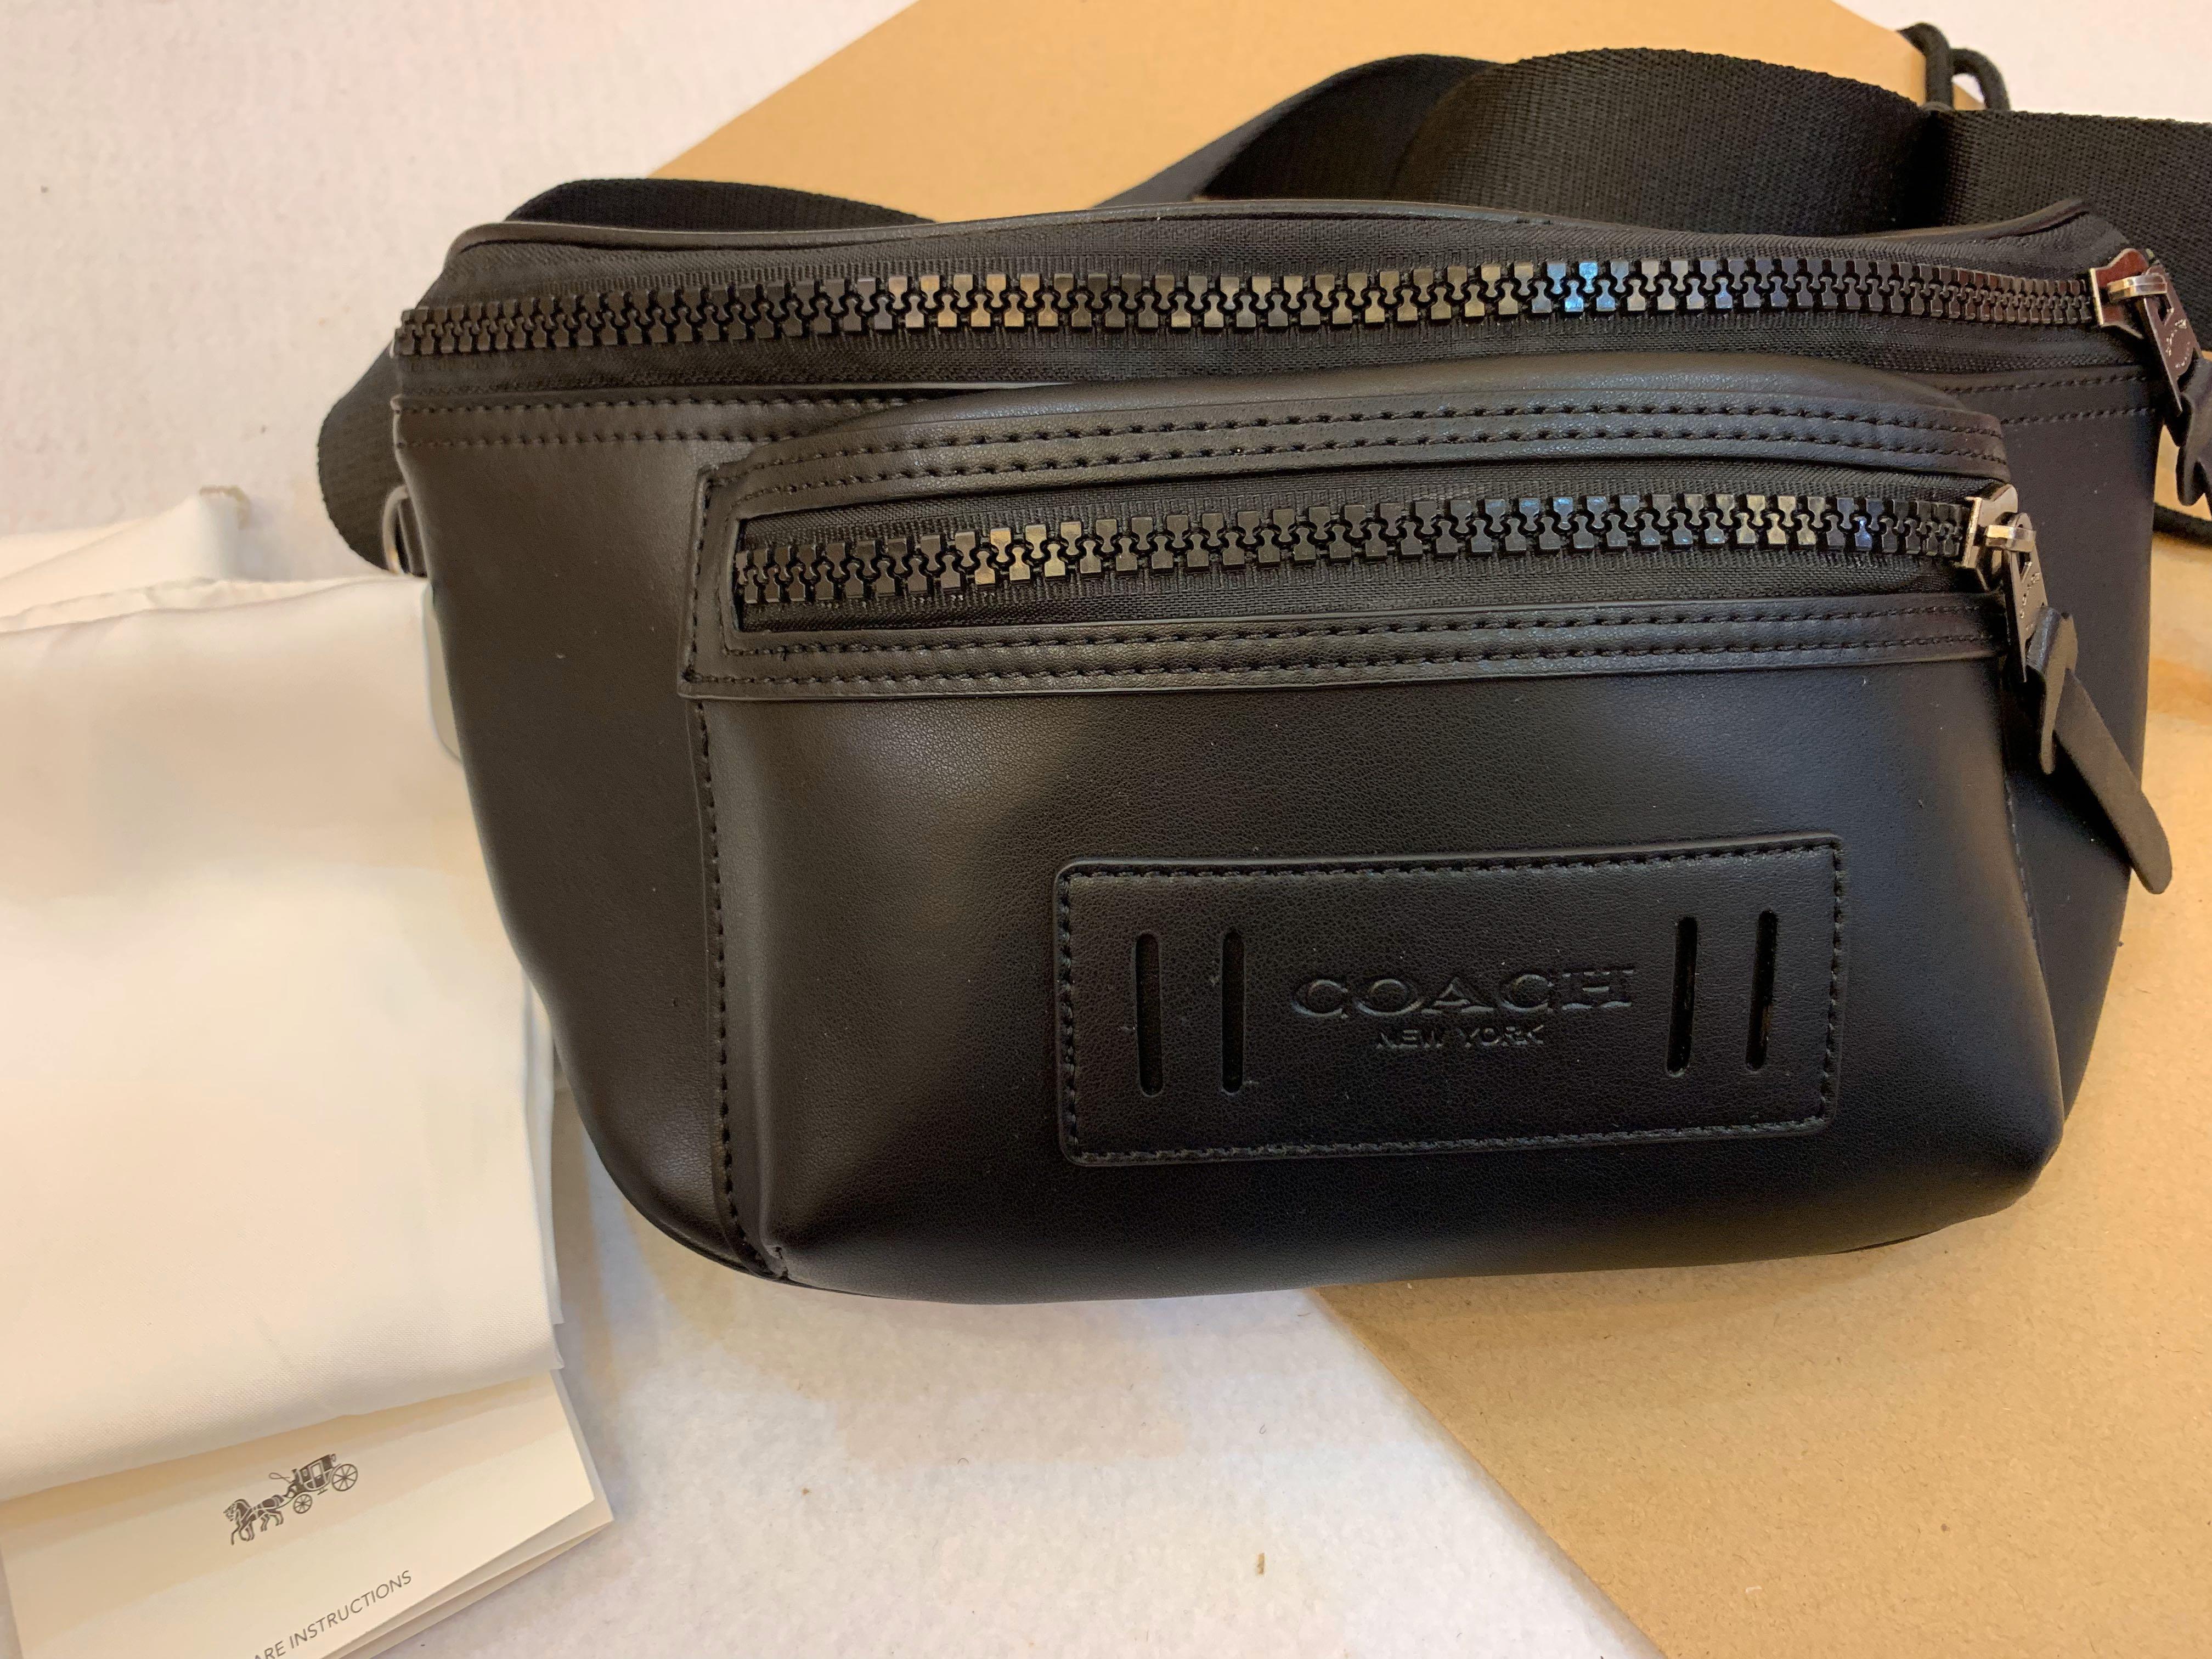 Authentic coach 75776 men belt bag crossbody bag sling bag